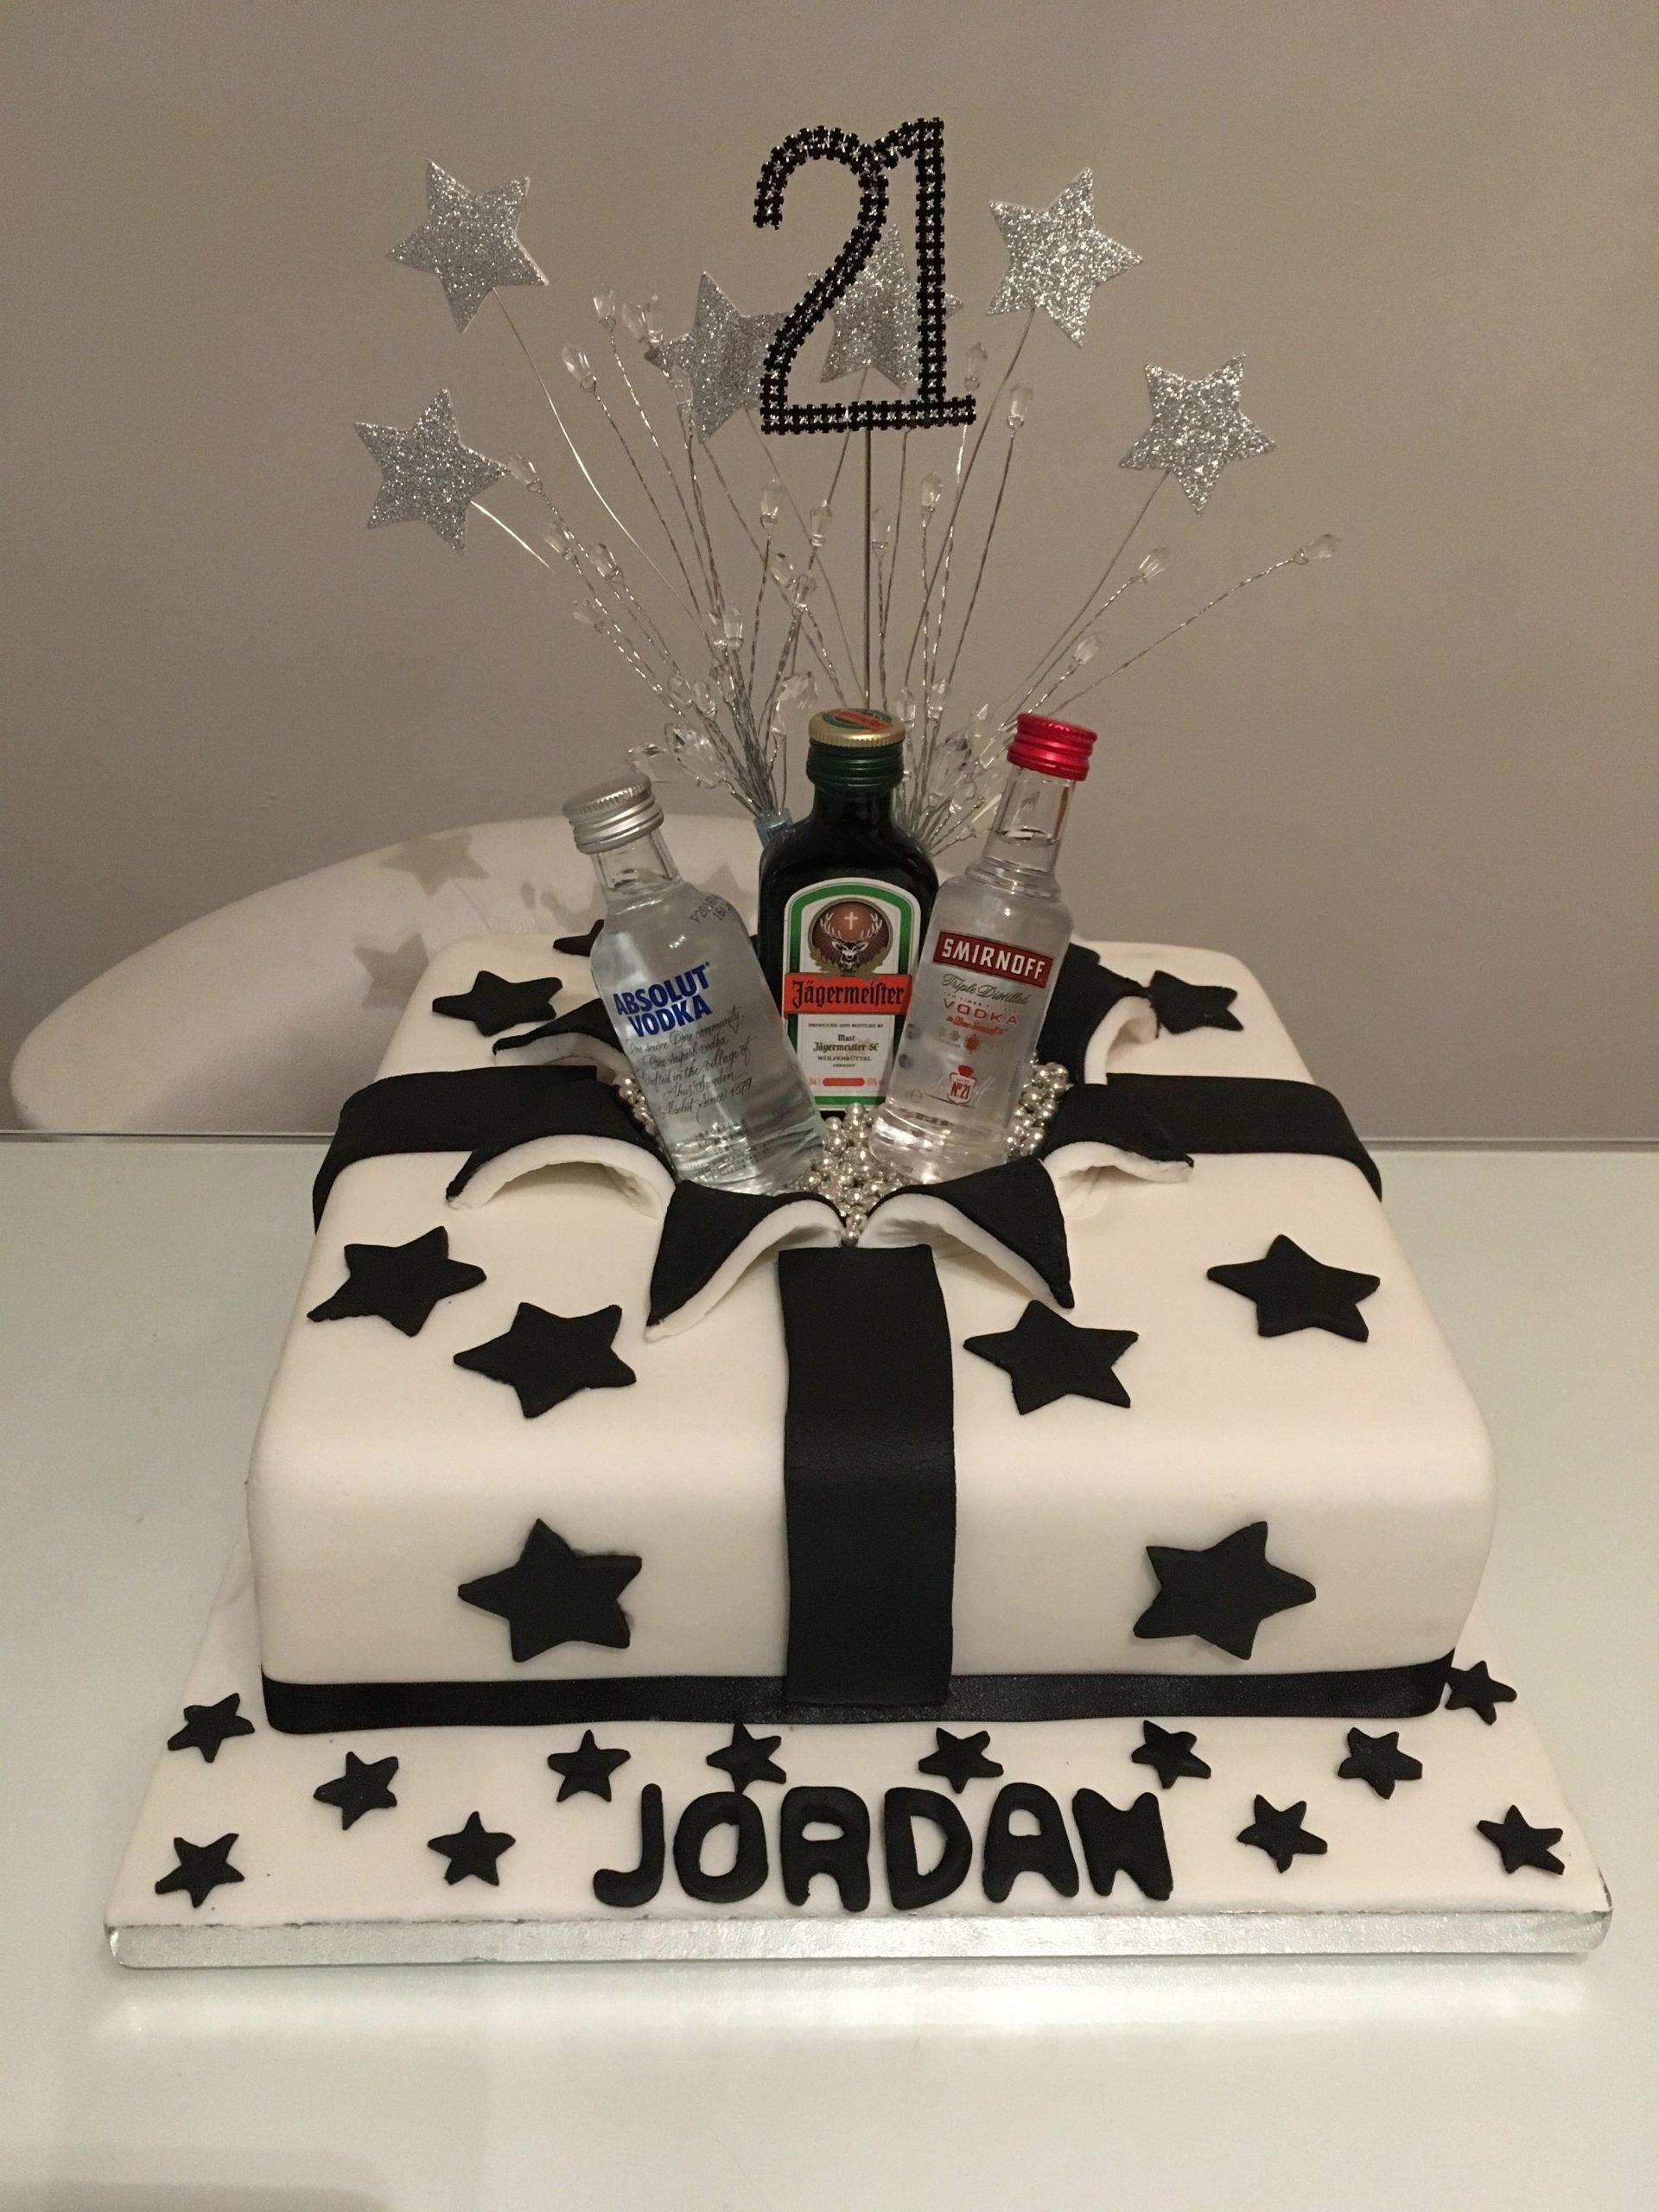 21st birthday cake decorating ideas in 2020 21st